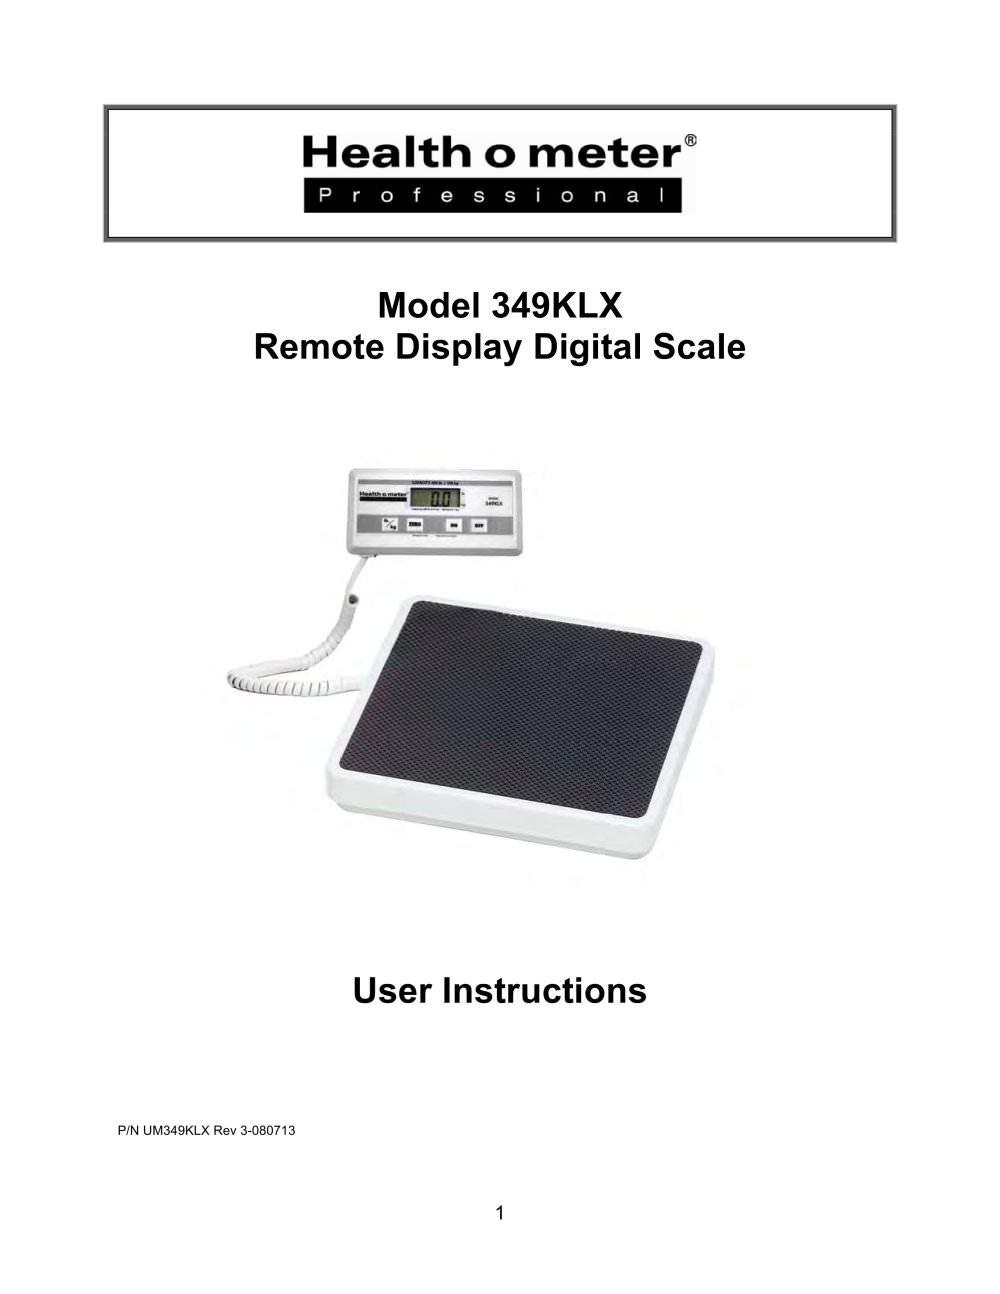 Model 349klx Health O Meter Professional Pdf Catalogue